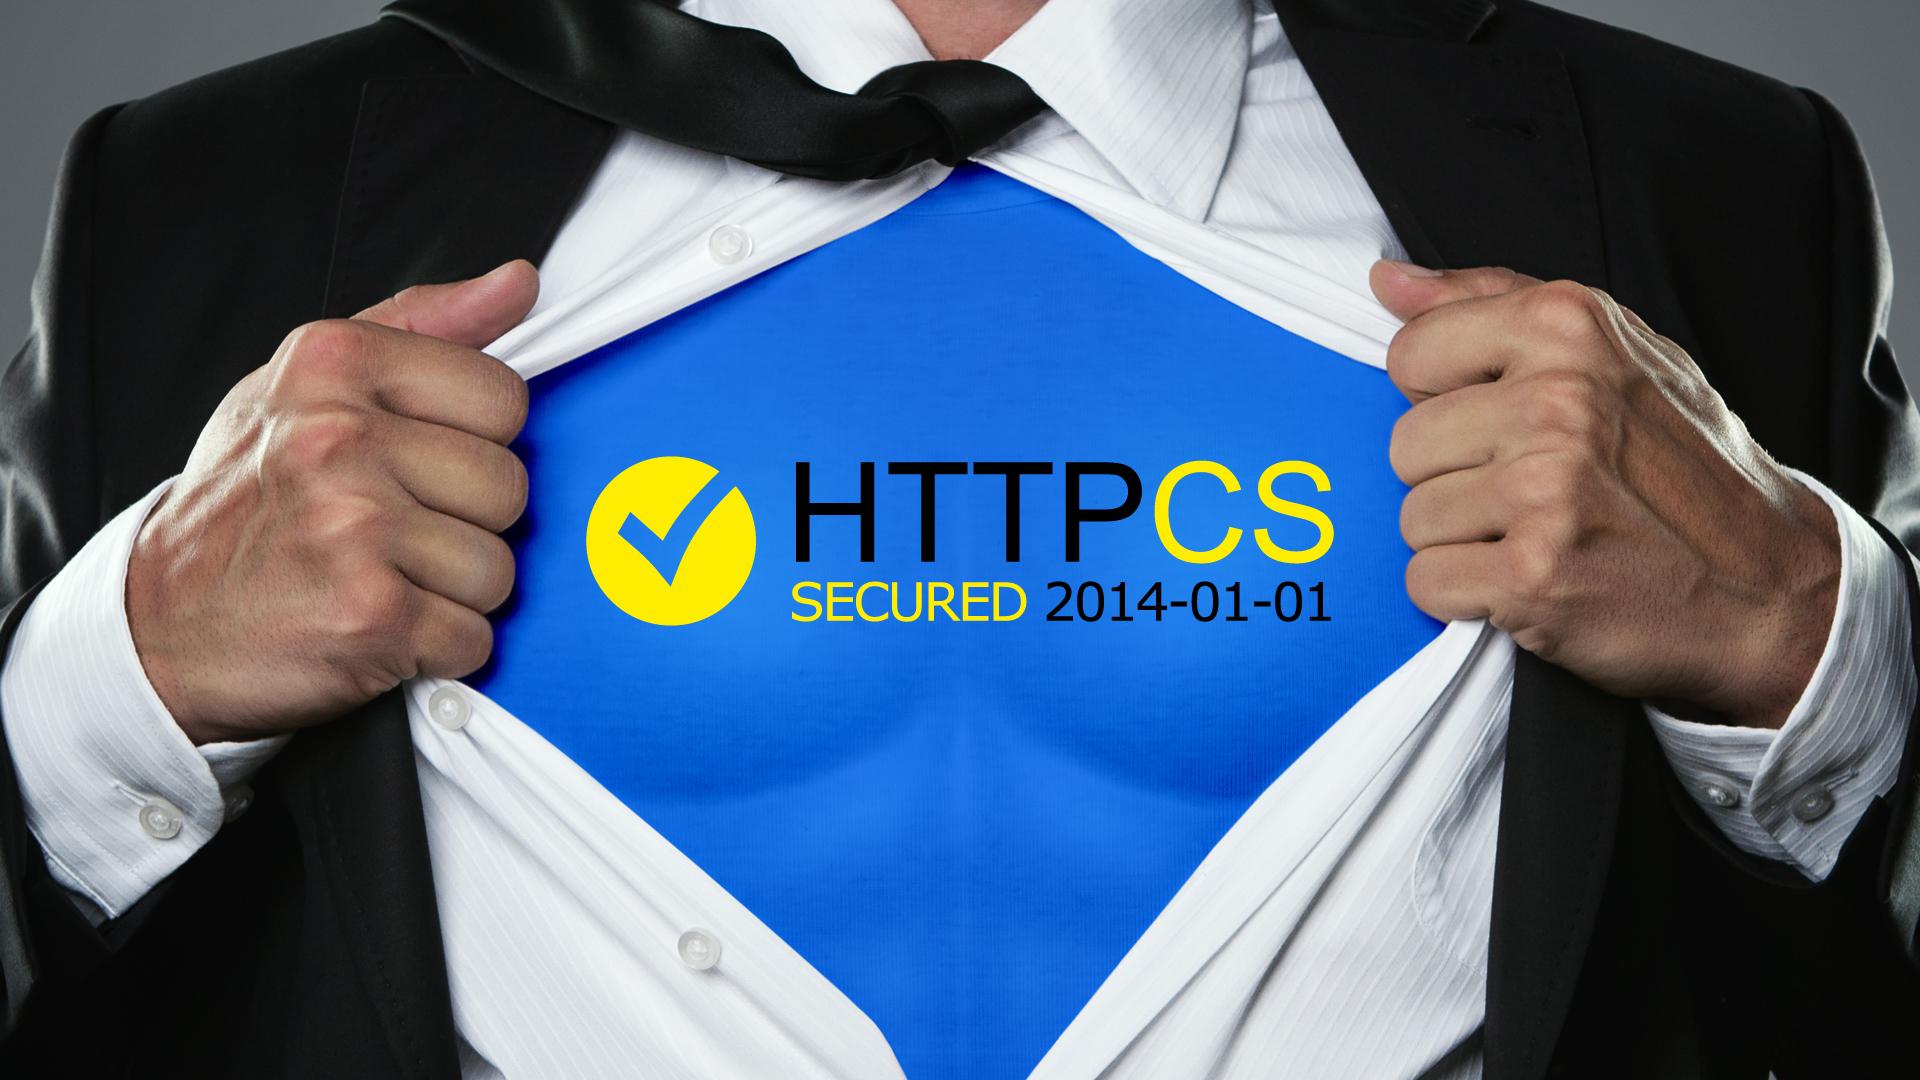 httpcs-creation-logo-securisation-web-caconcept-alexis-cretin-graphiste-montpellier